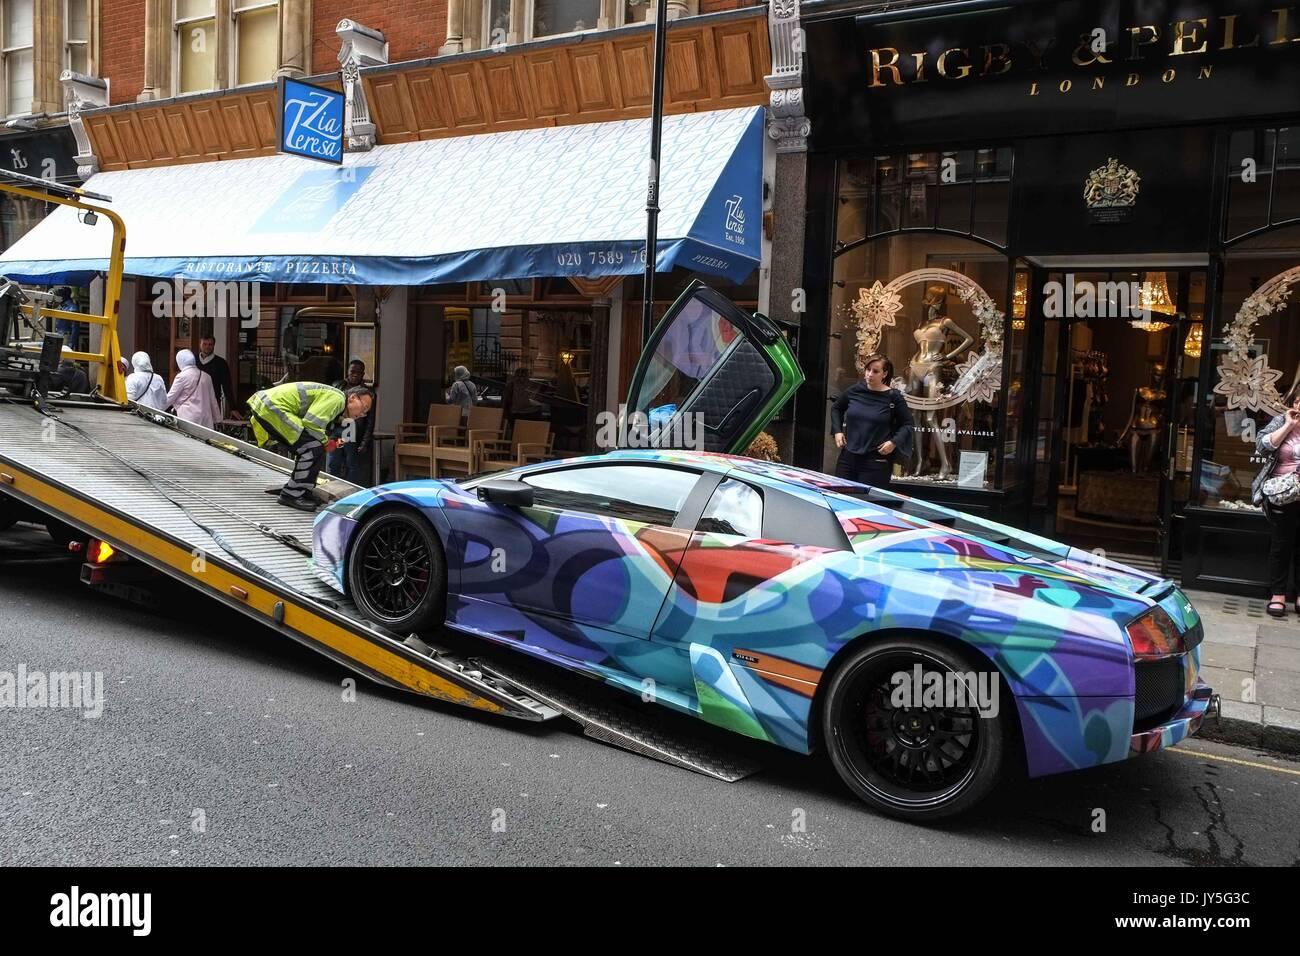 london-uk-18th-august-2017-broken-down-l